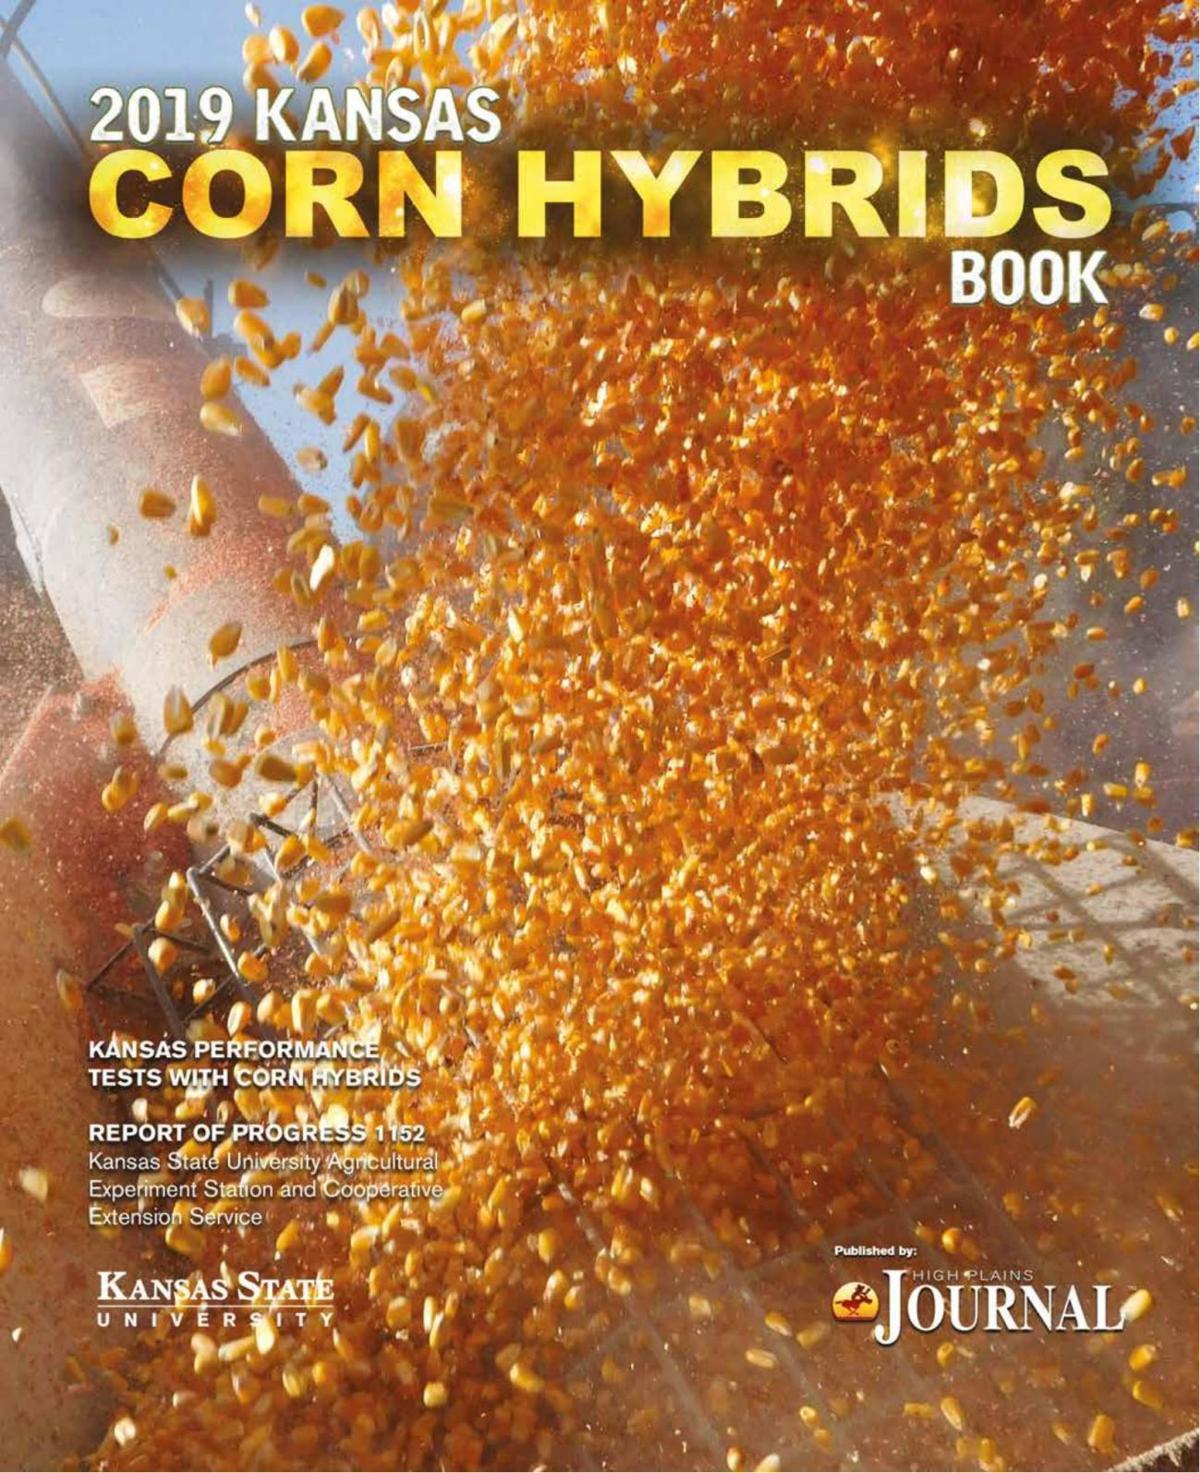 2019 Kansas Corn